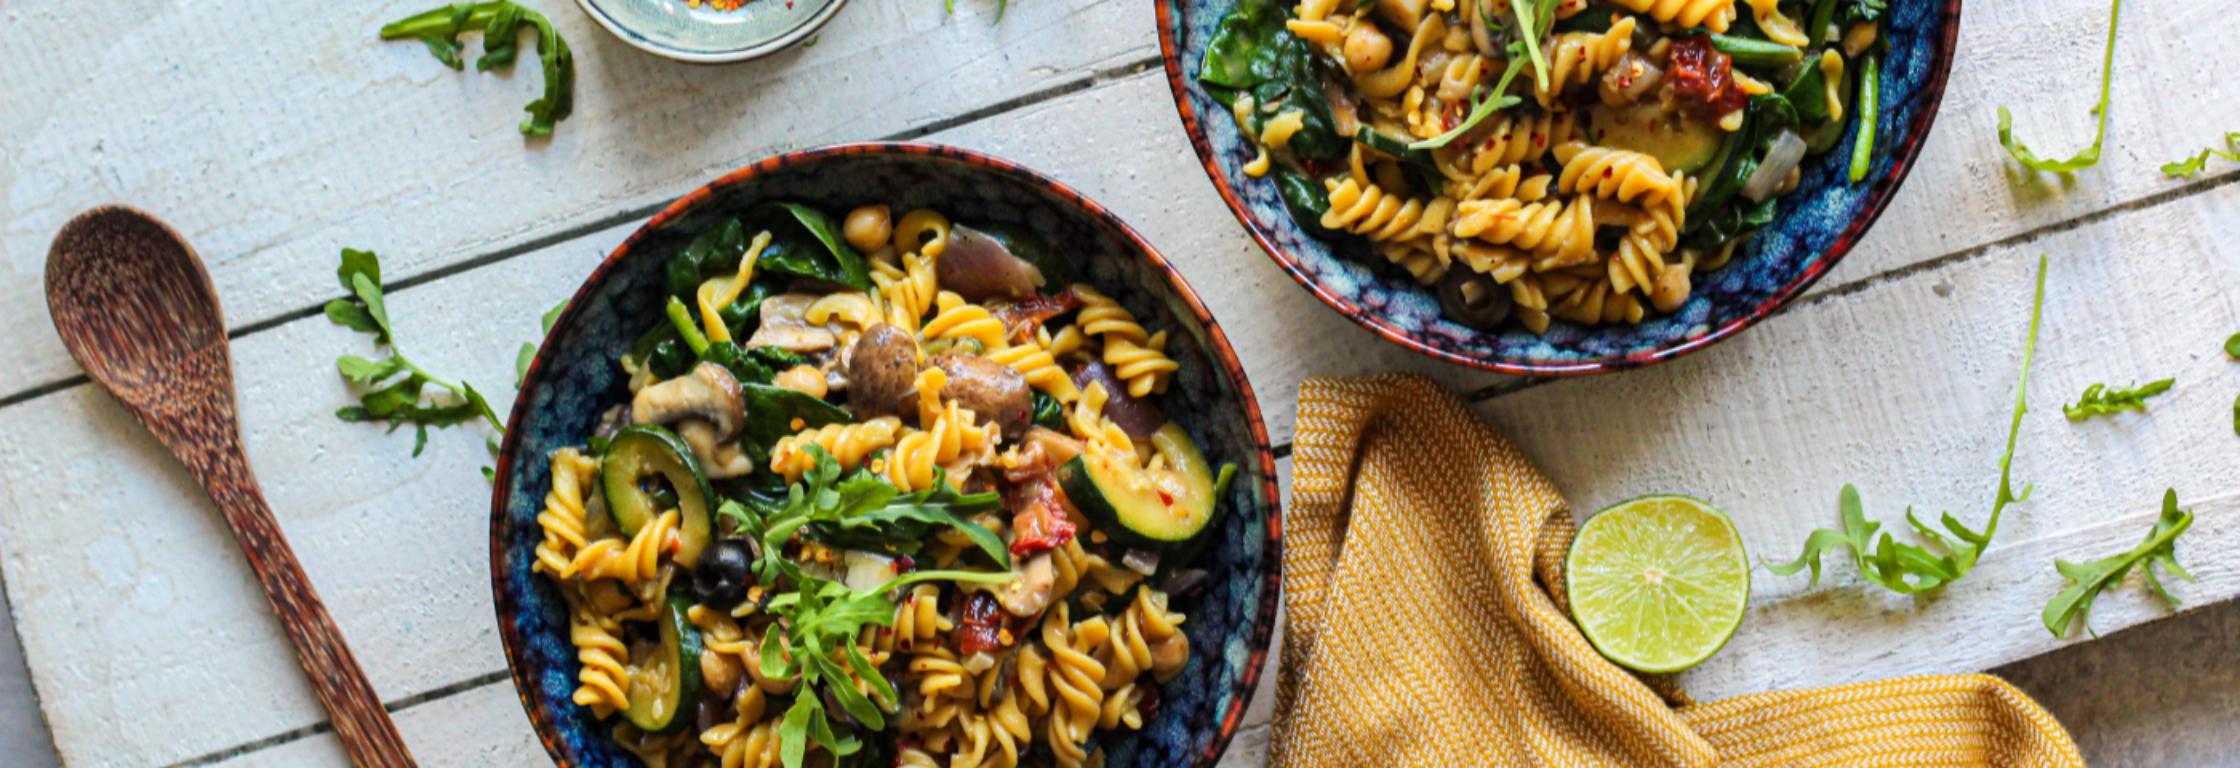 Eiwitrijke home-made pastasaus